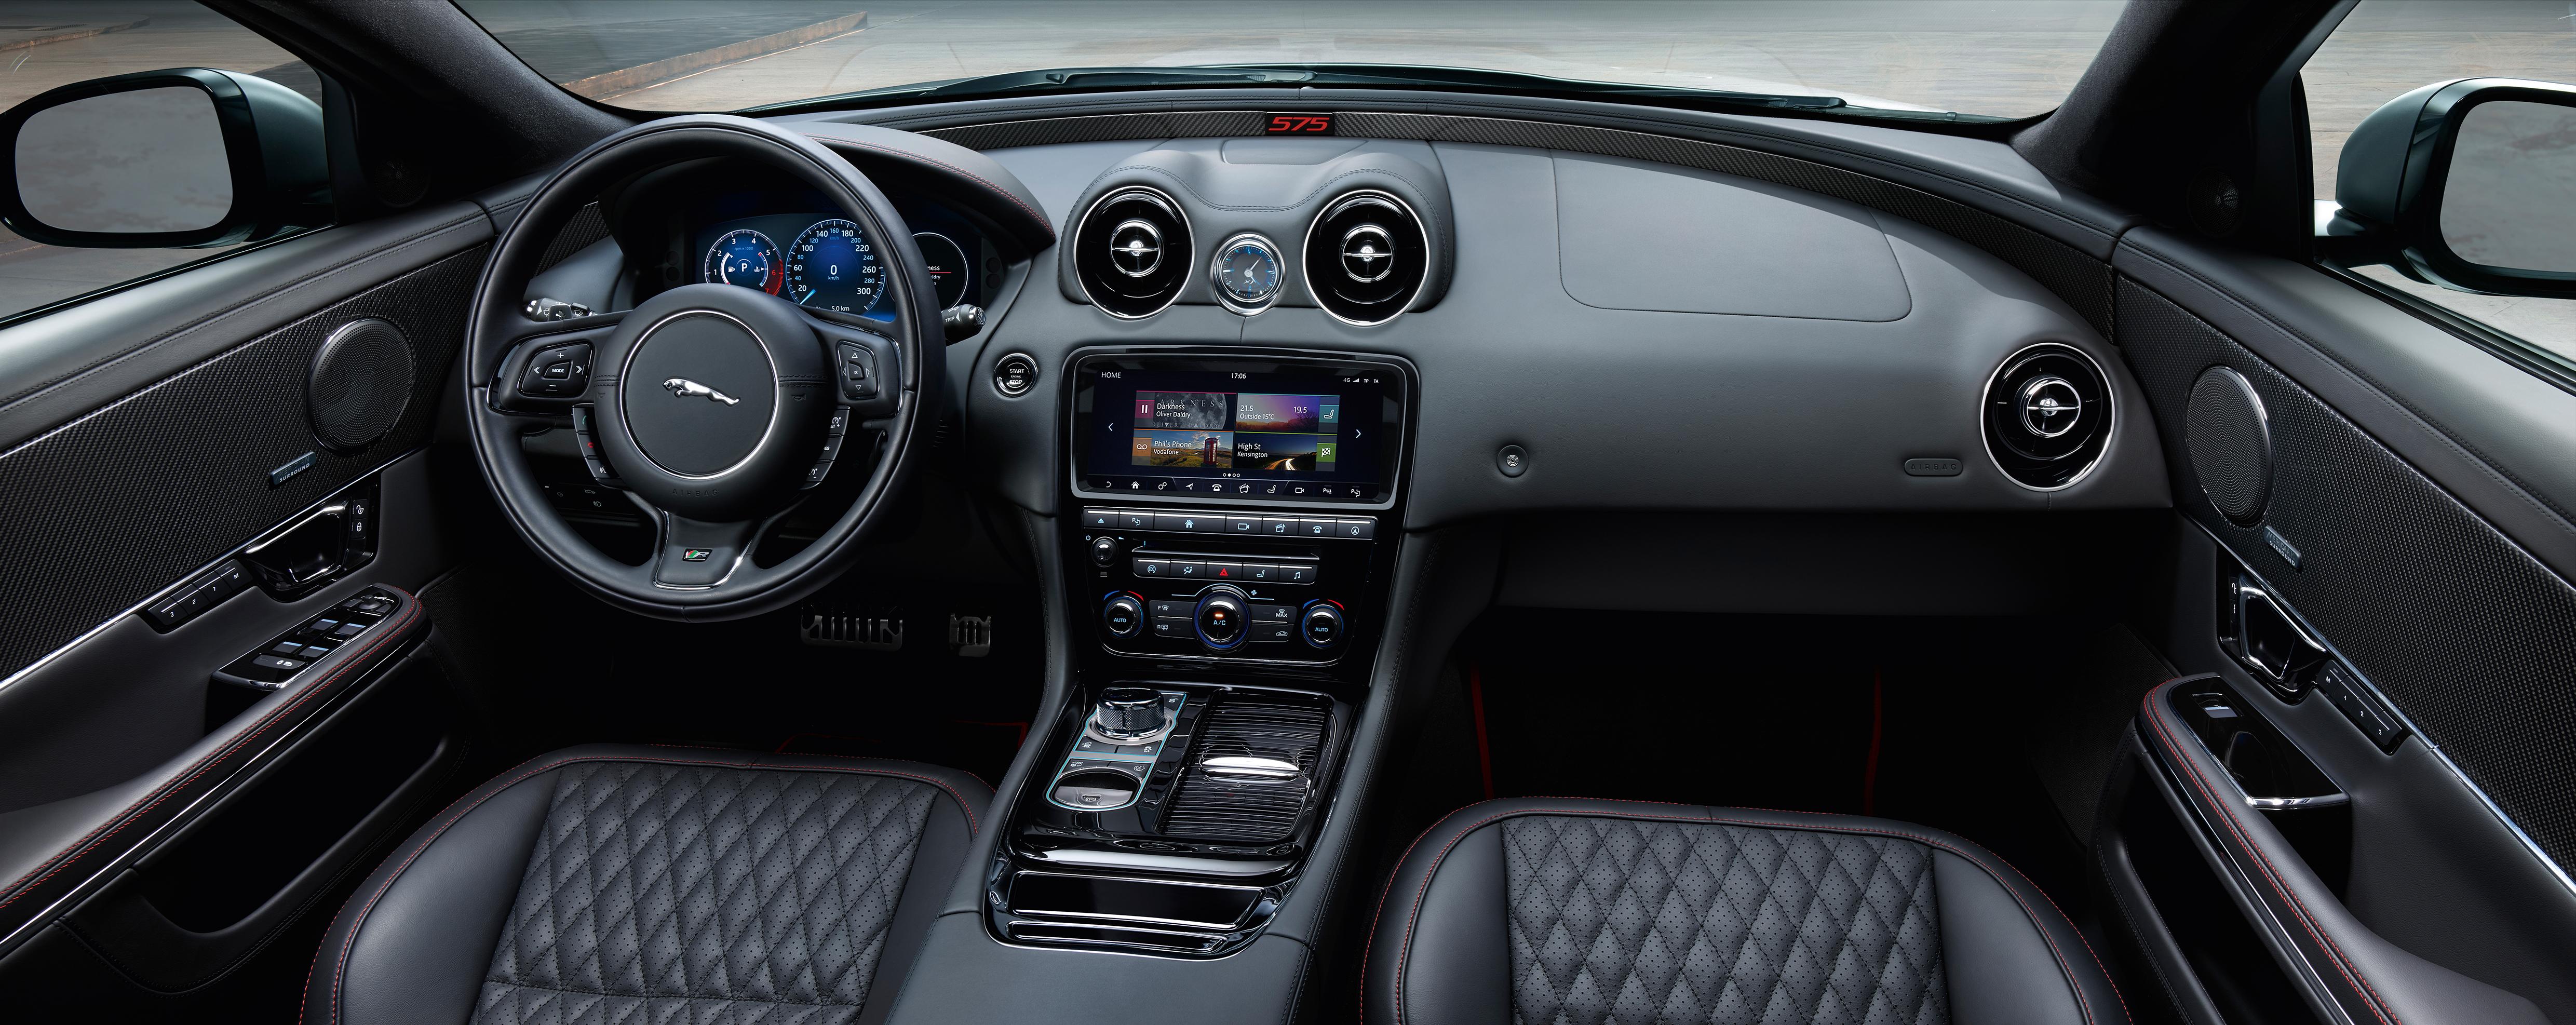 Jaguar Xj 2018 Model Year Jaguar Homepage International